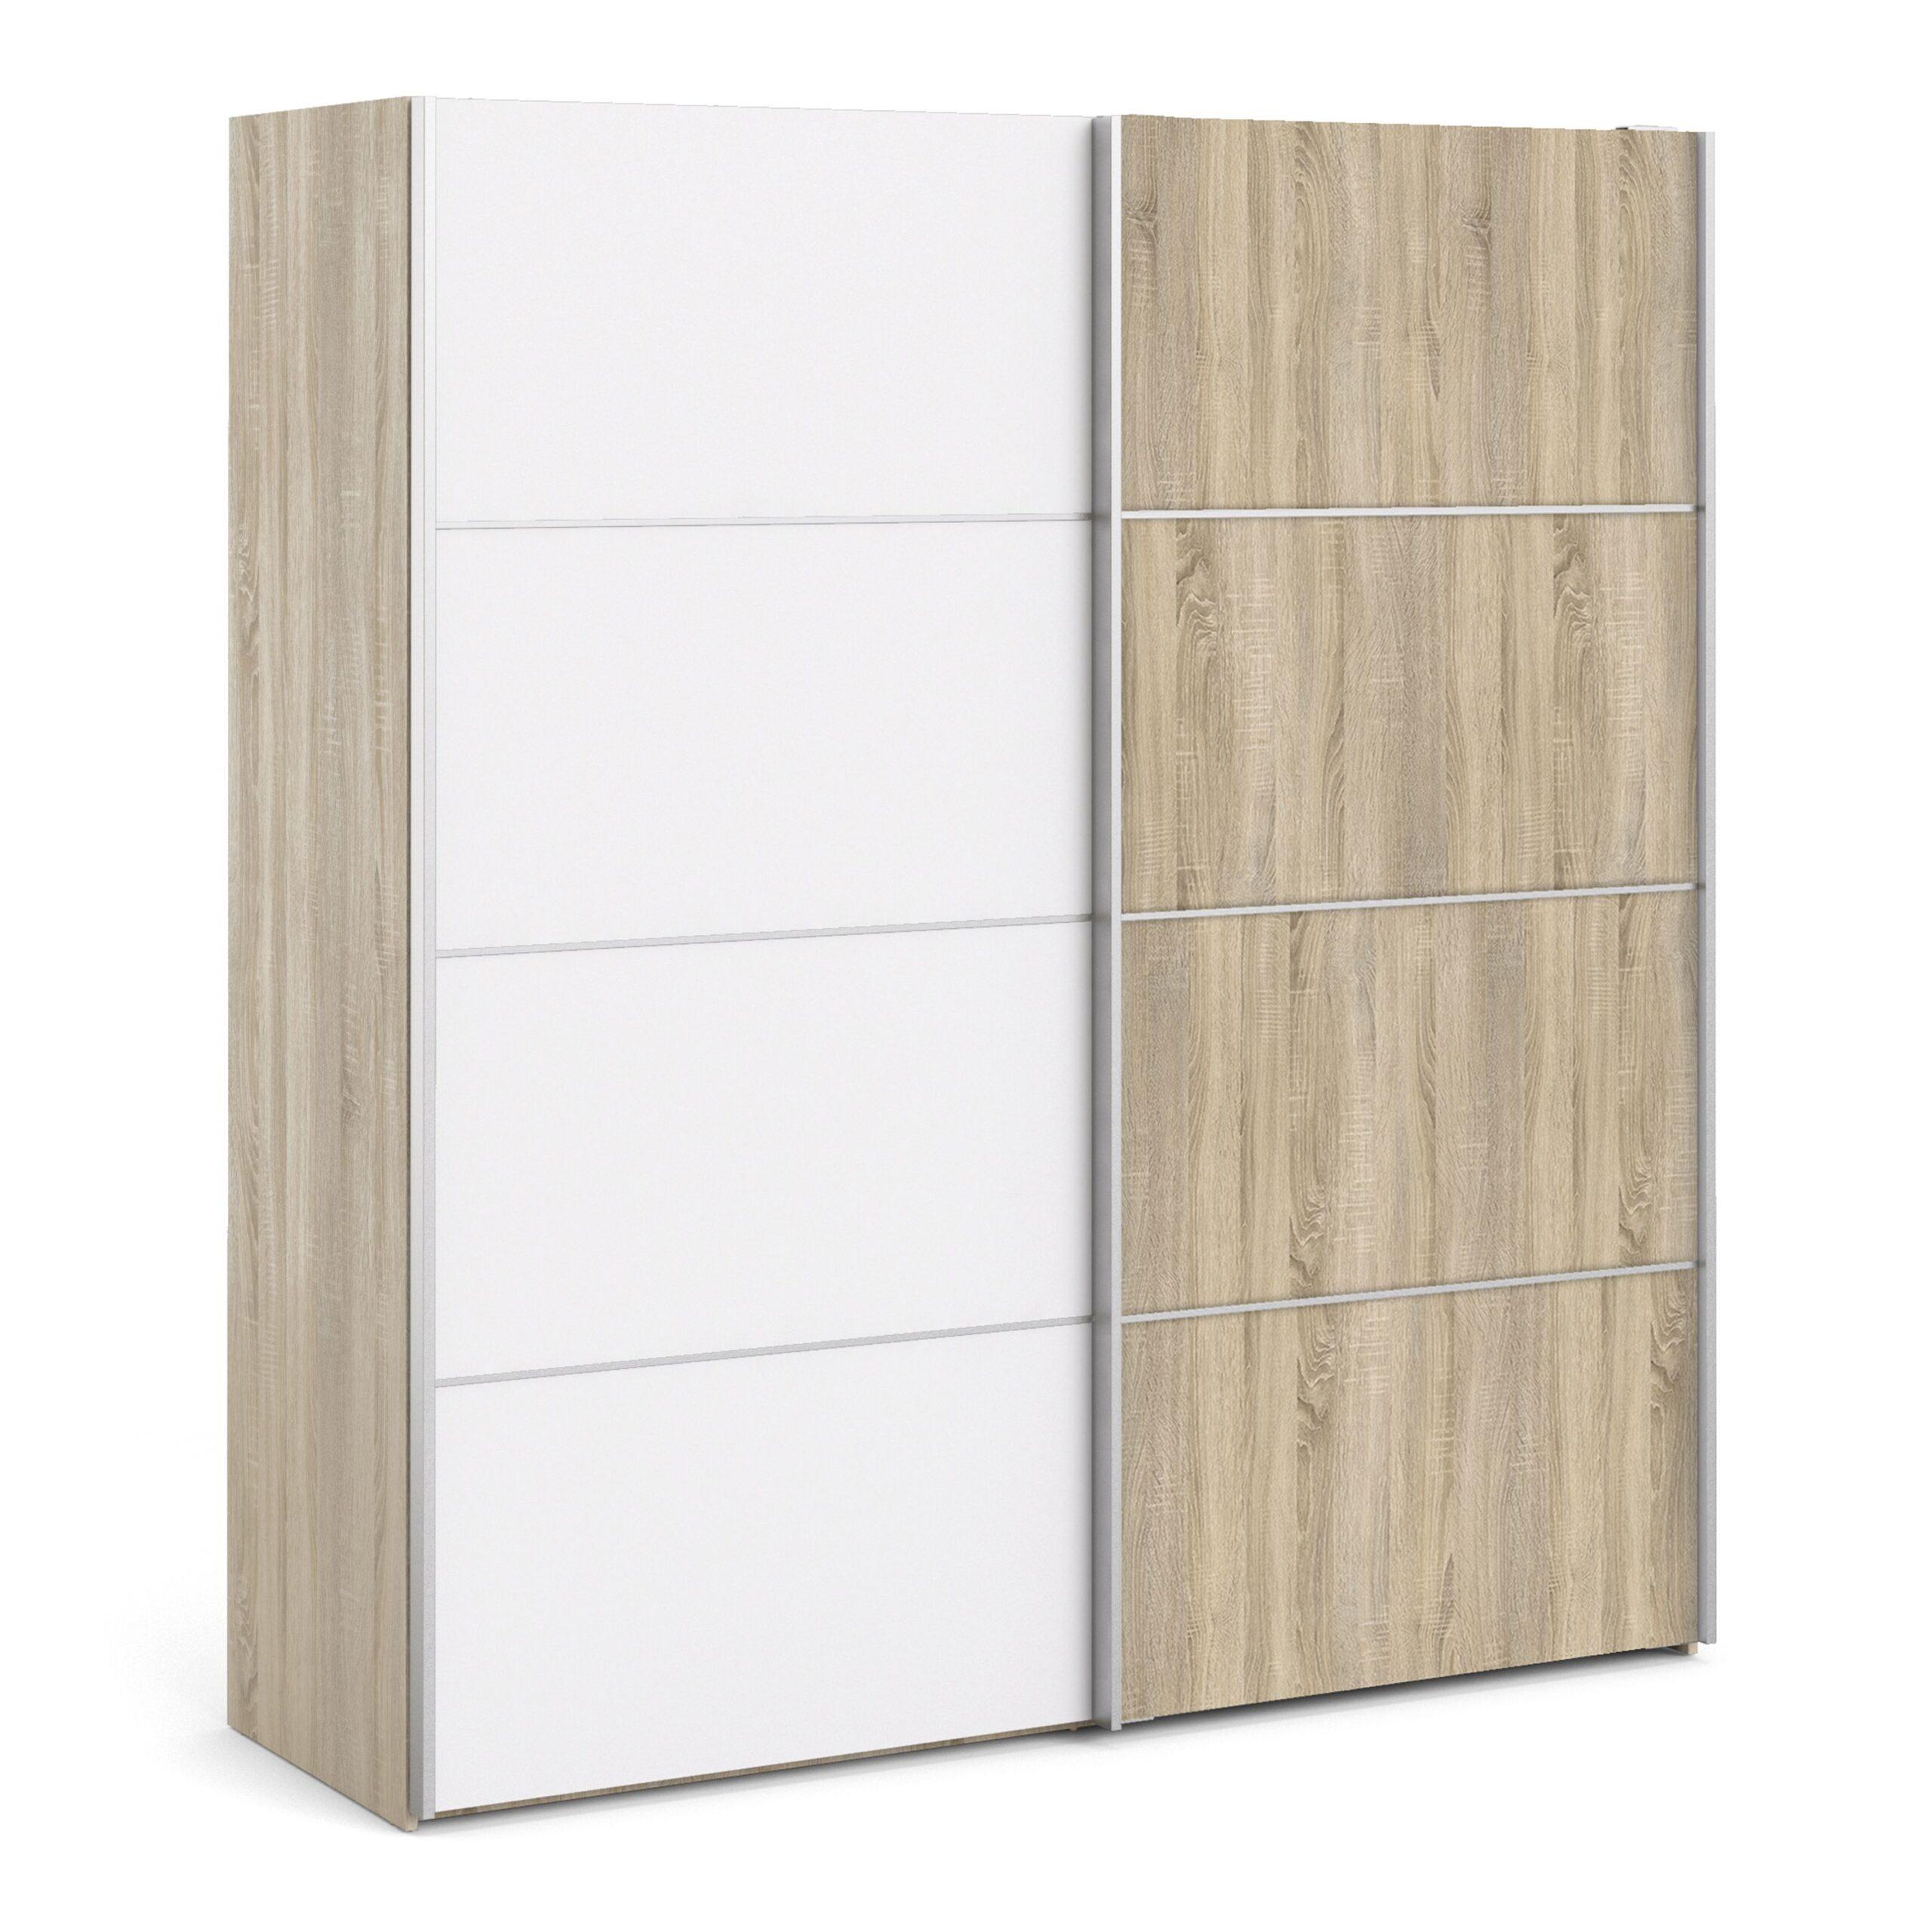 Phillipe Sliding Wardrobe 180cm in Oak with White and Oak doors with 5 Shelves